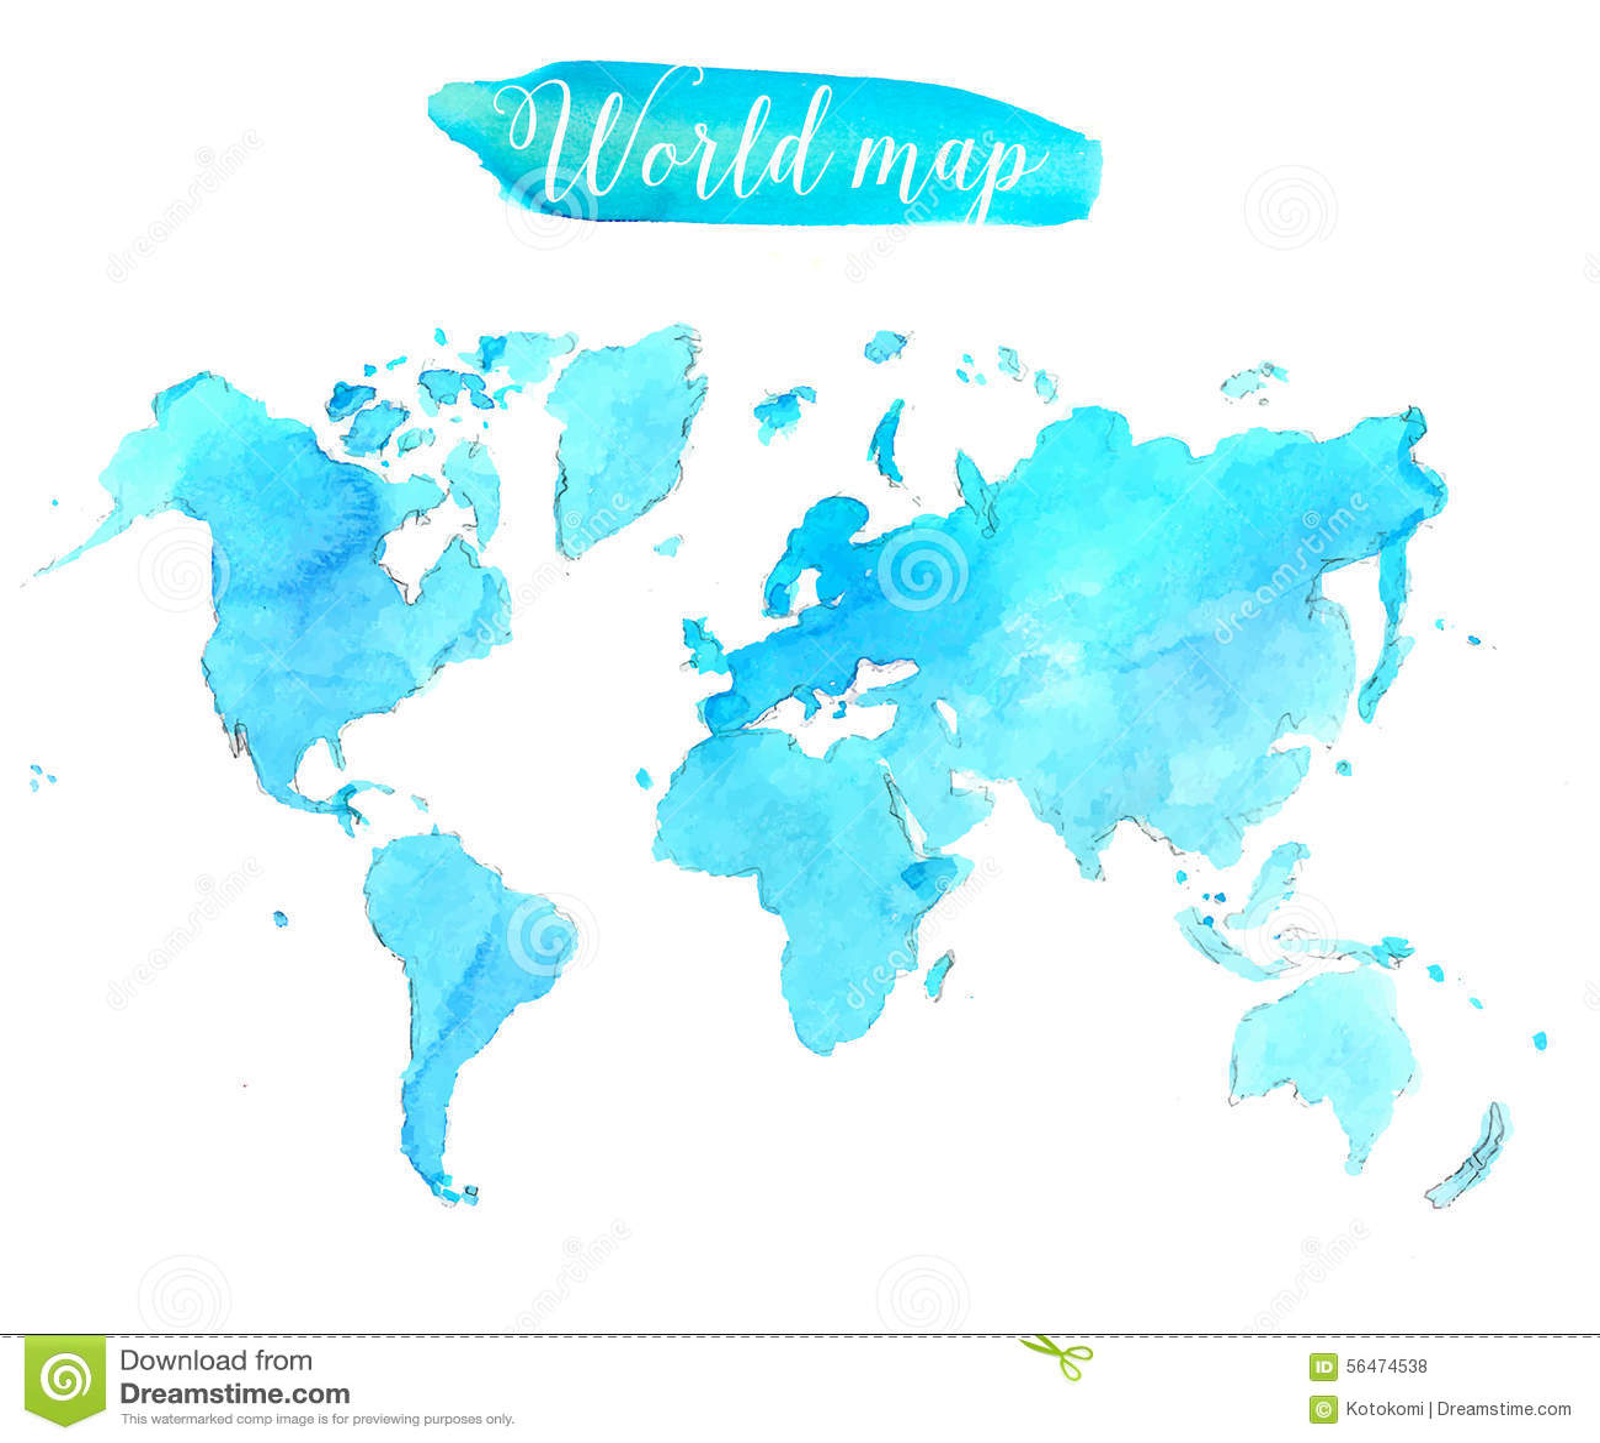 Vector world map watercolor stock vector illustration of banner blue watercolor world map vector artistic royalty free stock photos gumiabroncs Gallery